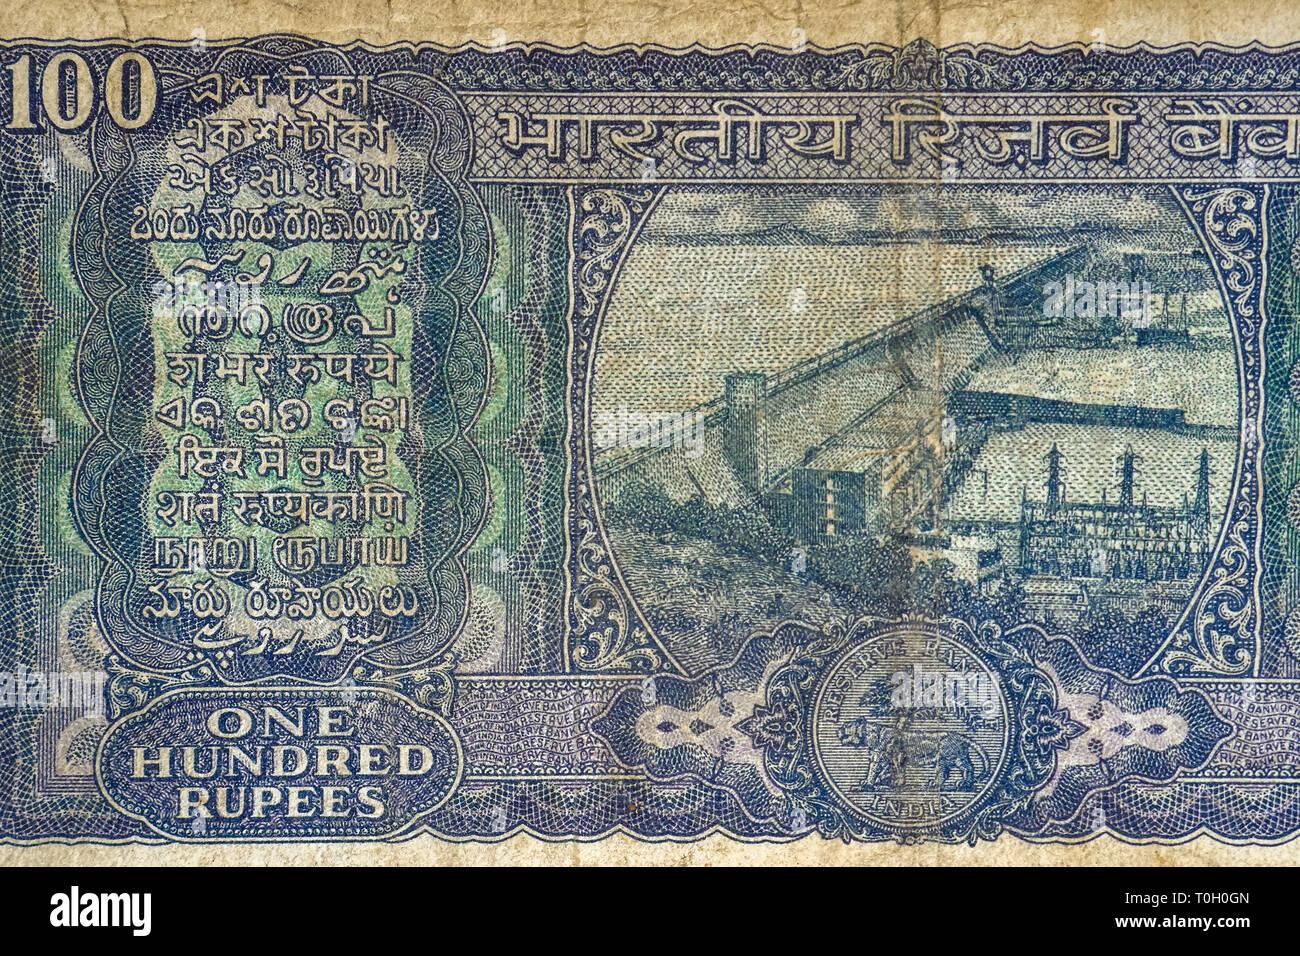 19-03-2019-the Hirakud Dam and Hydro-Electric station. on The Back of  100 rupee Bank Note qt Kalyan Near mumbai Maharashtra INDIA - Stock Image